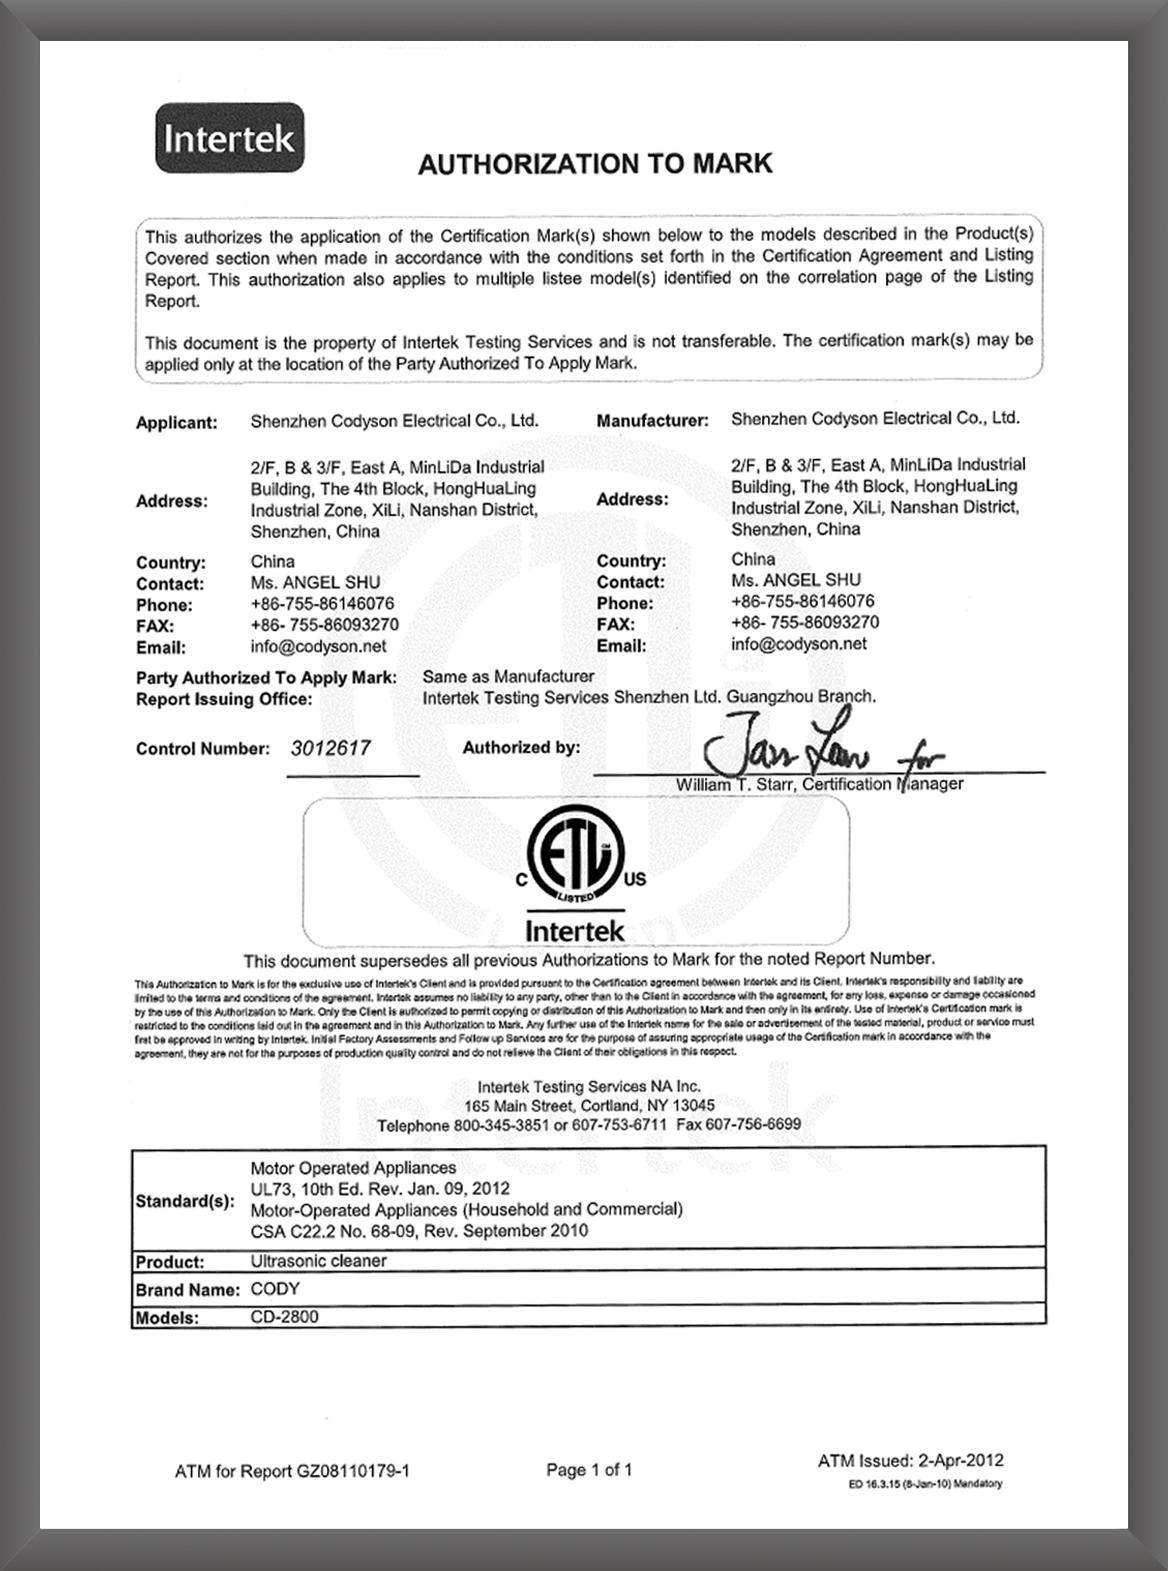 CETL Patent certificate